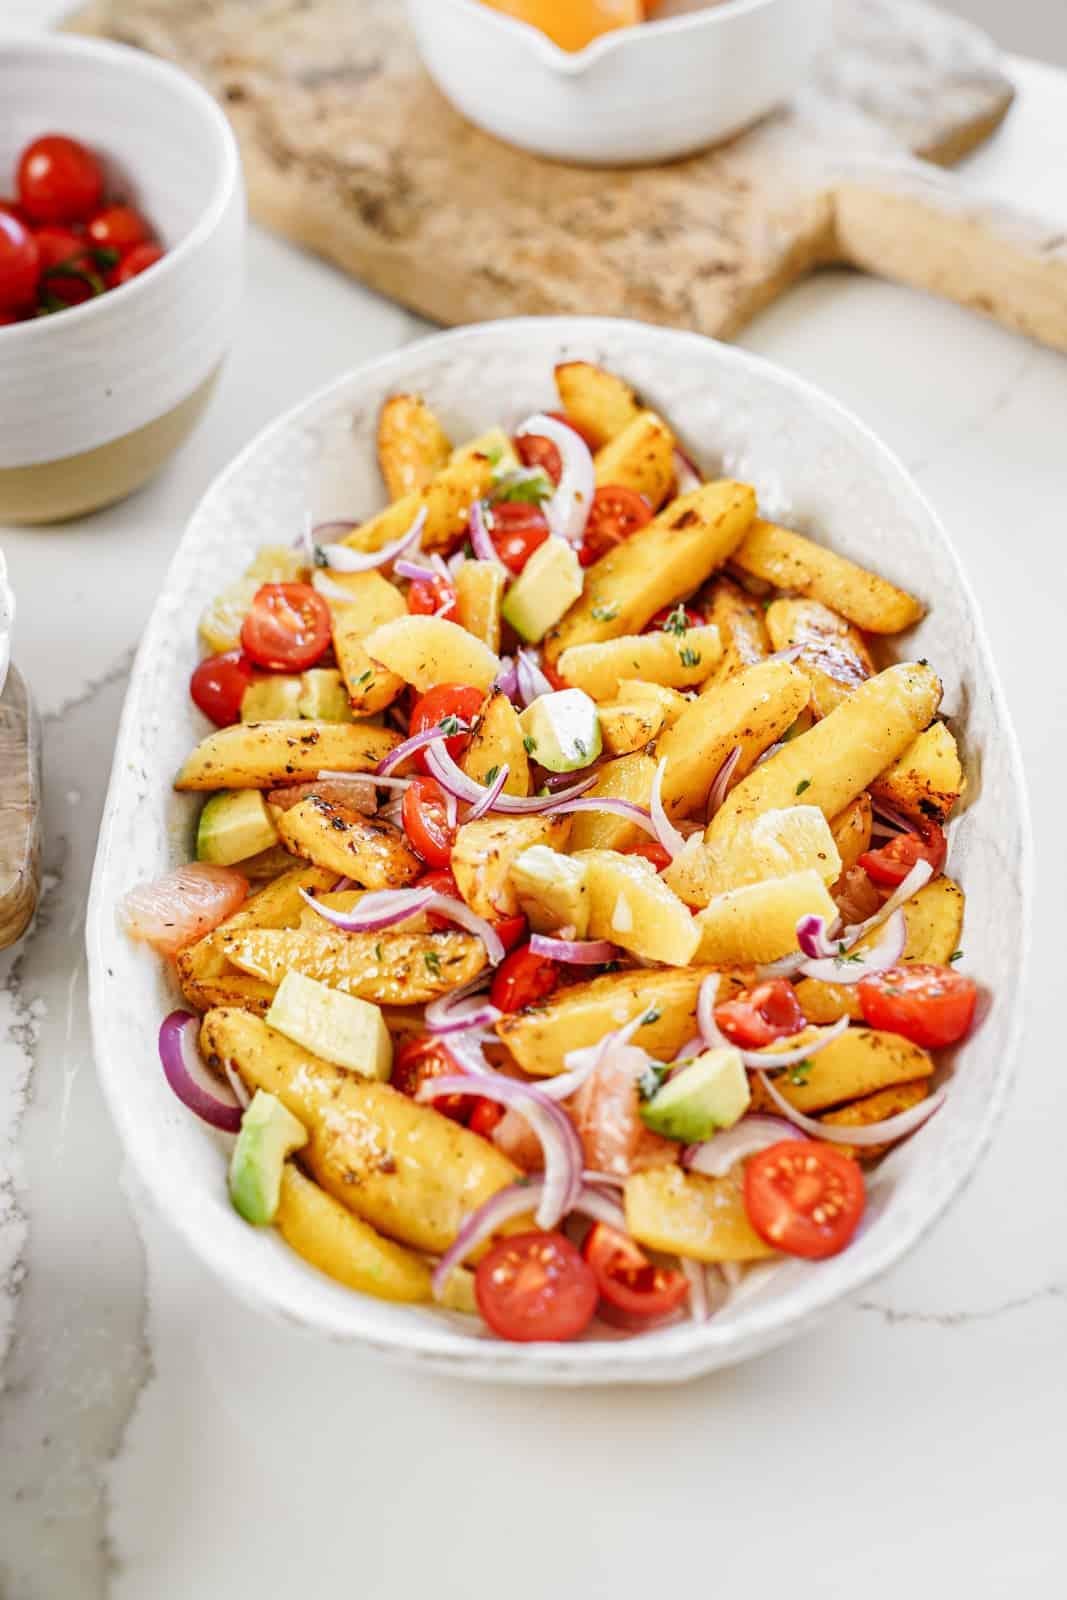 Big serving dish of vegan roasted potato salad with fresh veggies and citrus flavor.